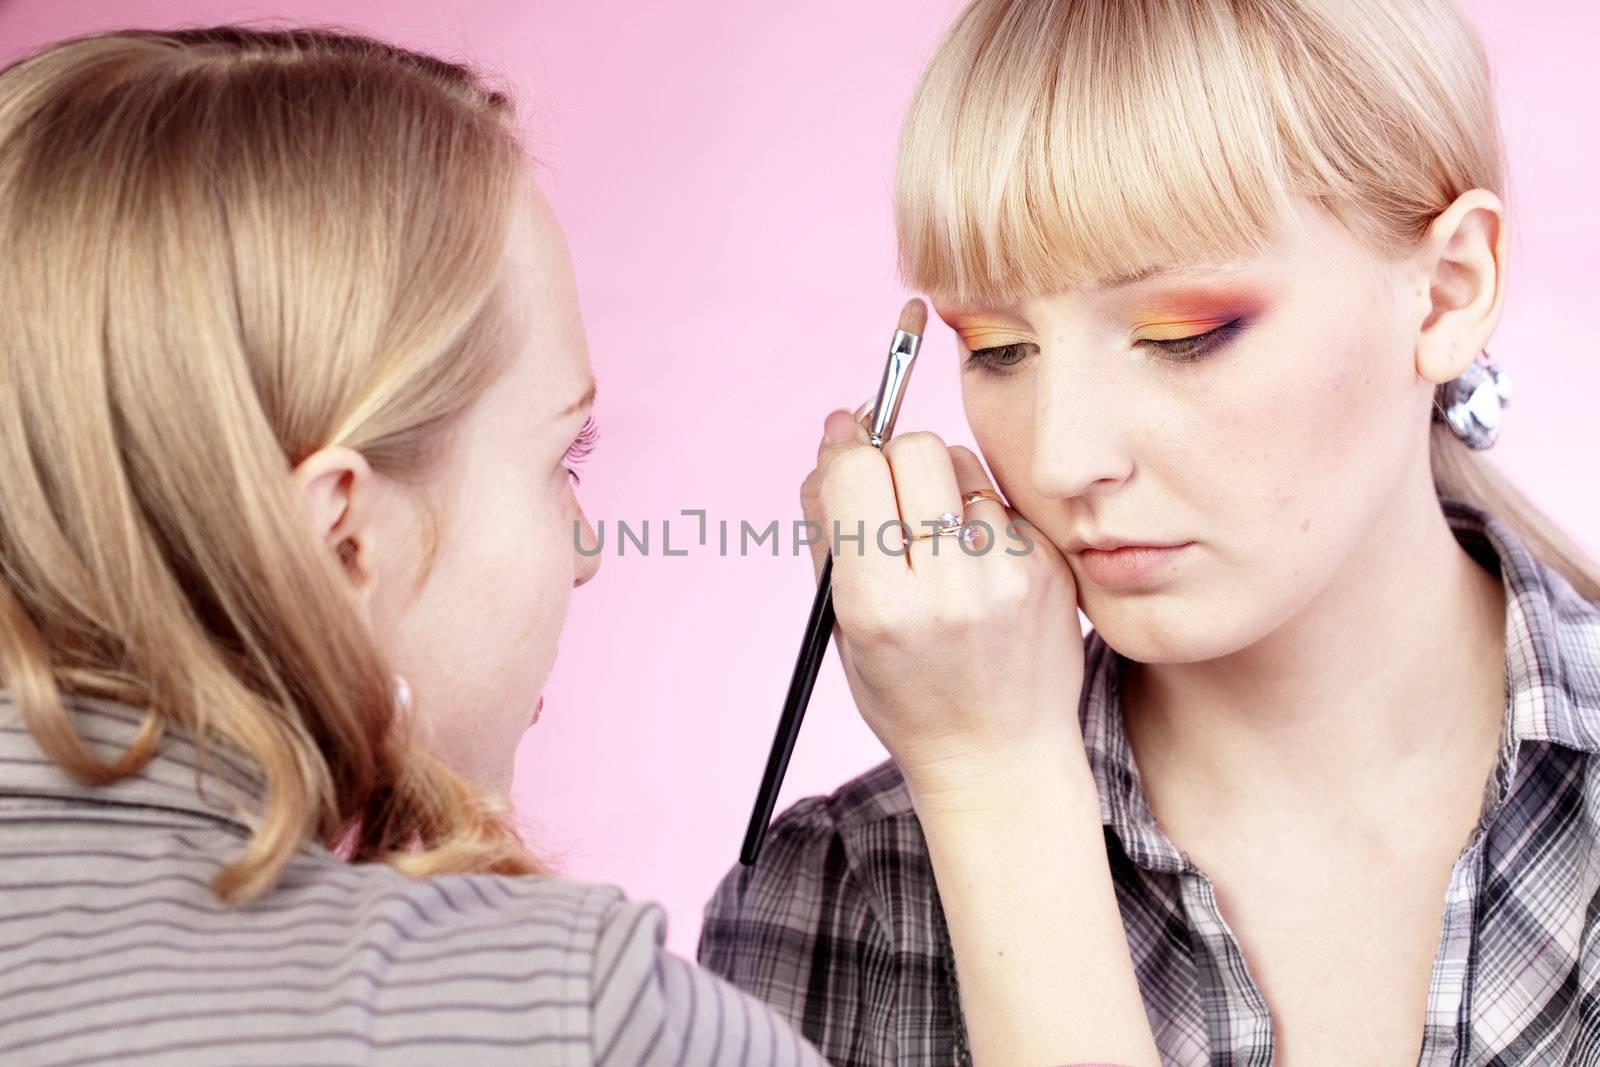 Studio series of doing fashion makeup